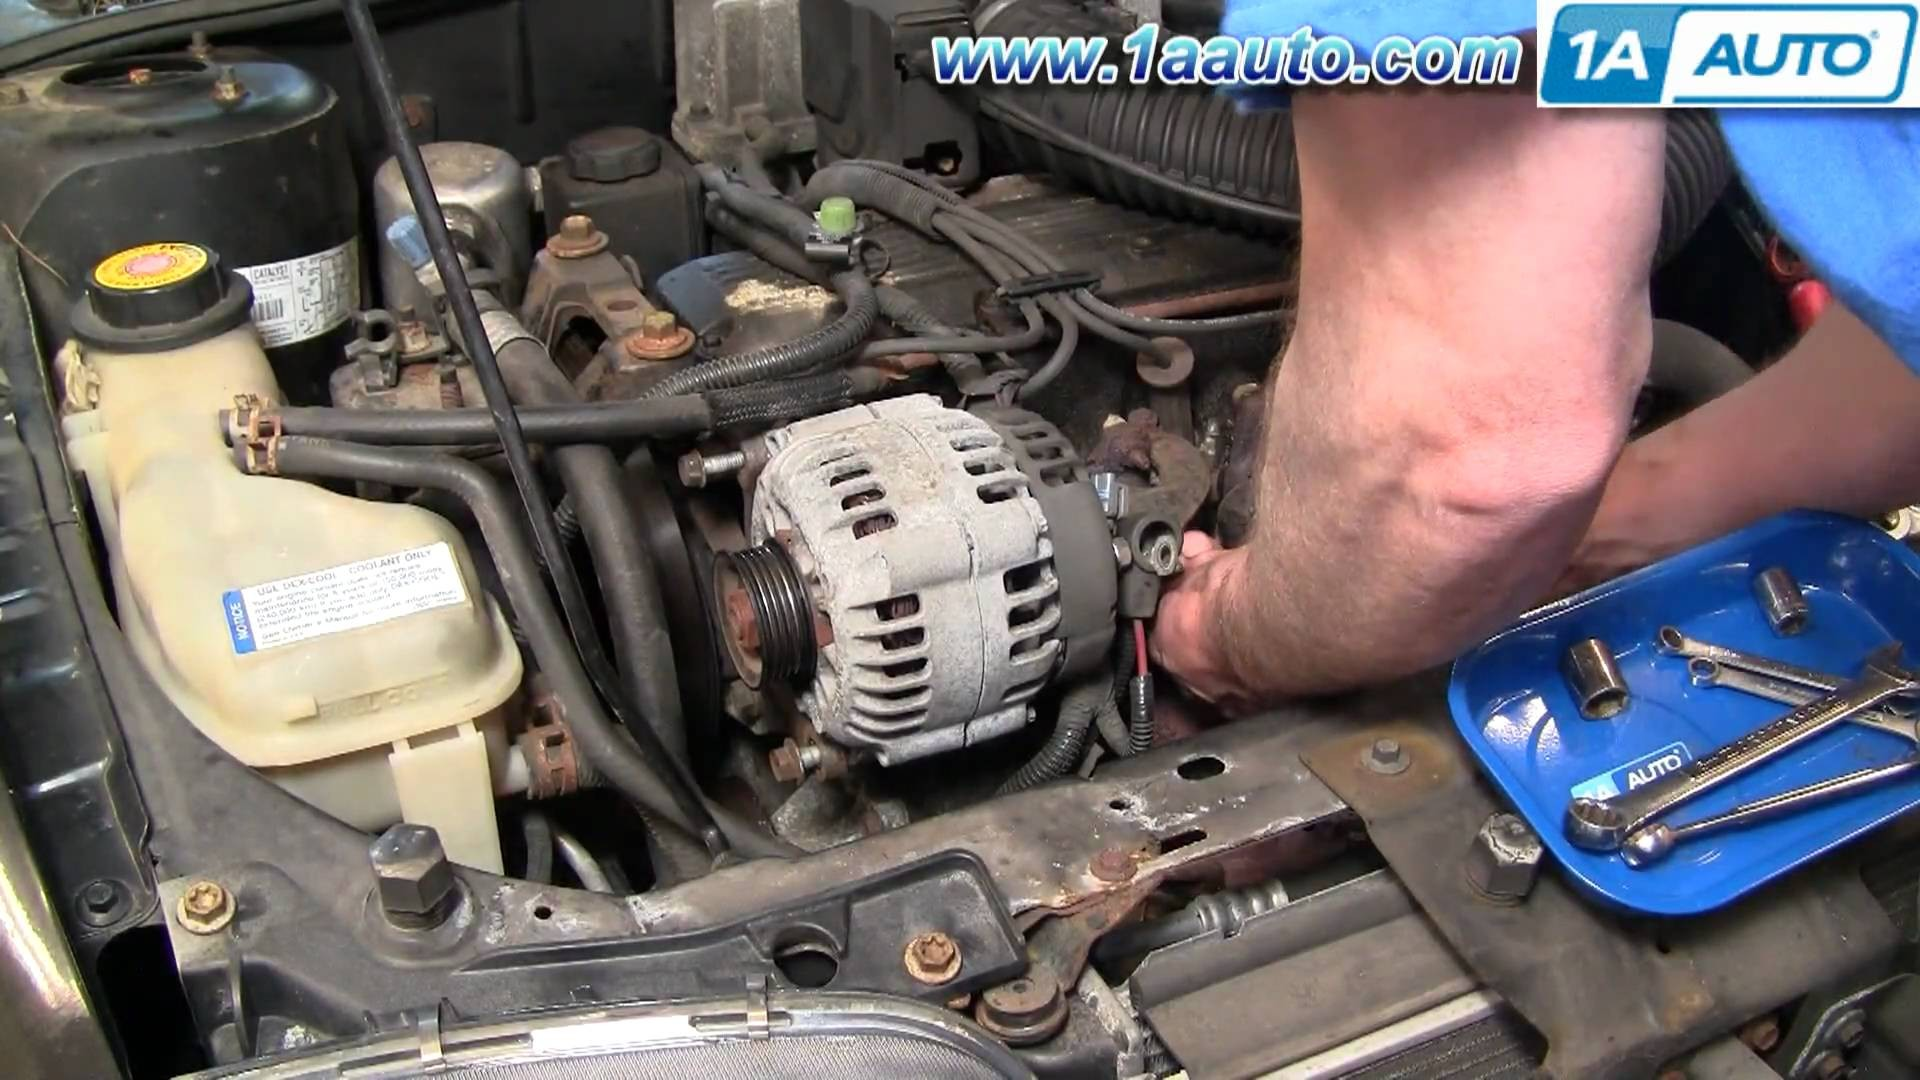 2004 chevy cavalier engine diagram ddec ii wiring  for free